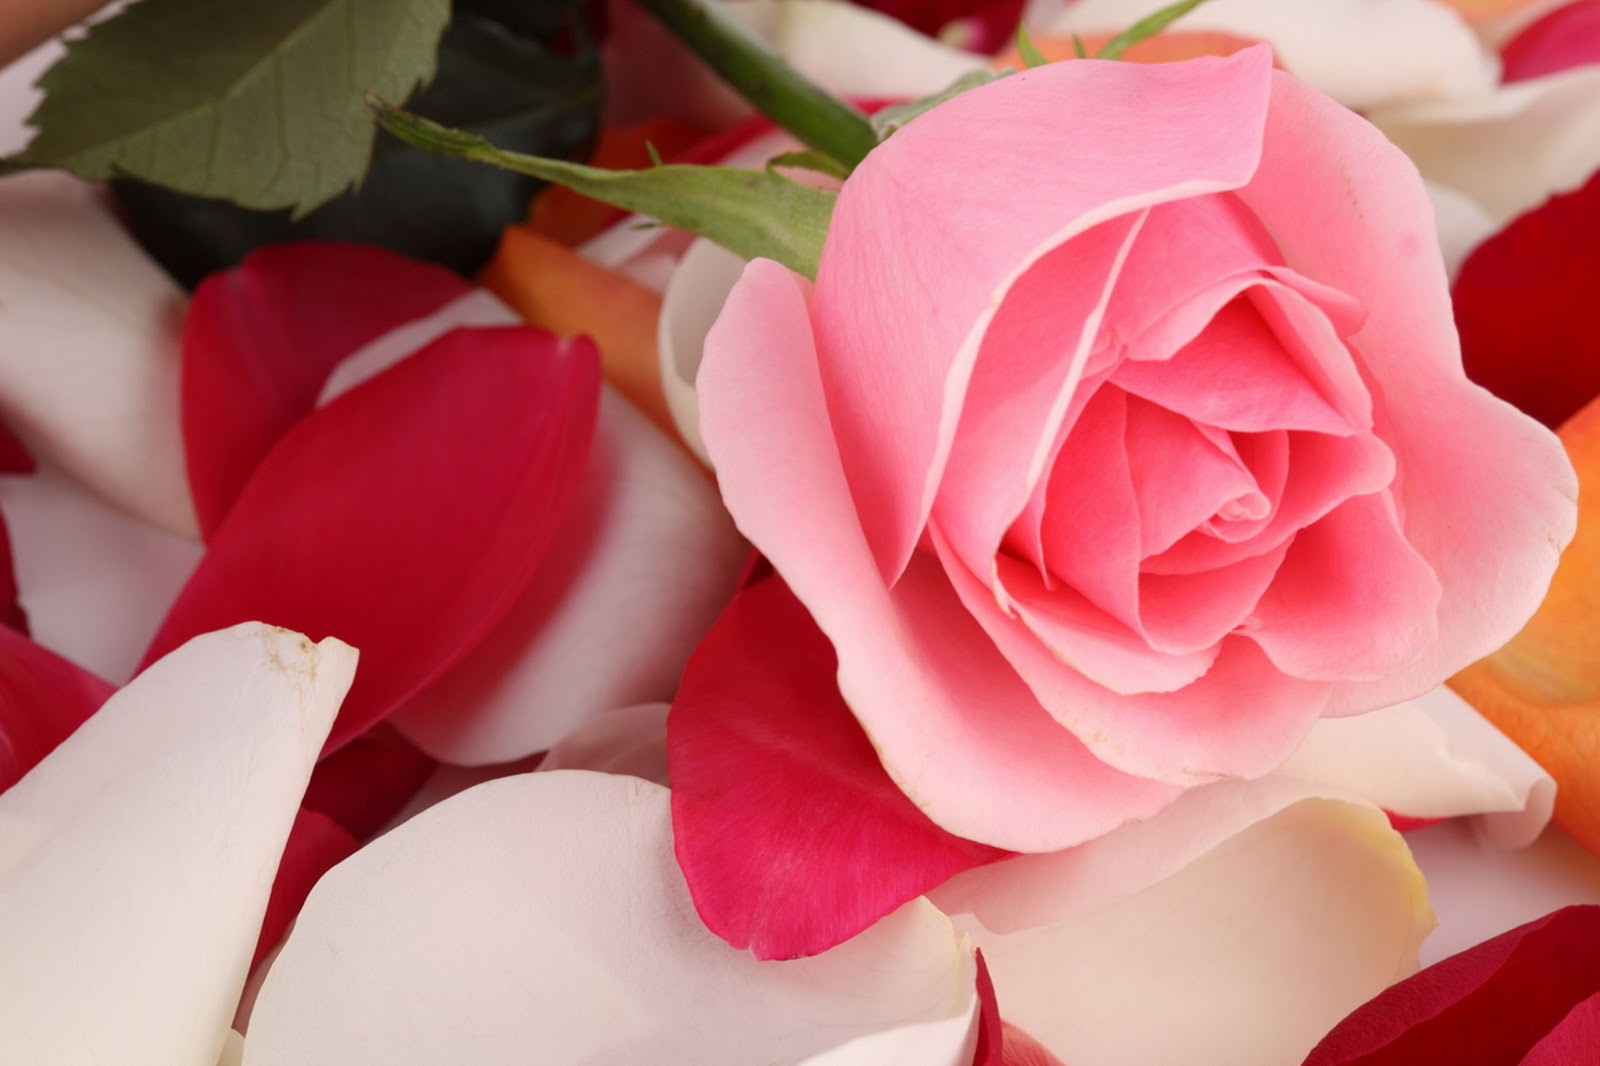 Unduh 870 Koleksi Wallpaper Bunga Mawar Yang Cantik HD Terbaik